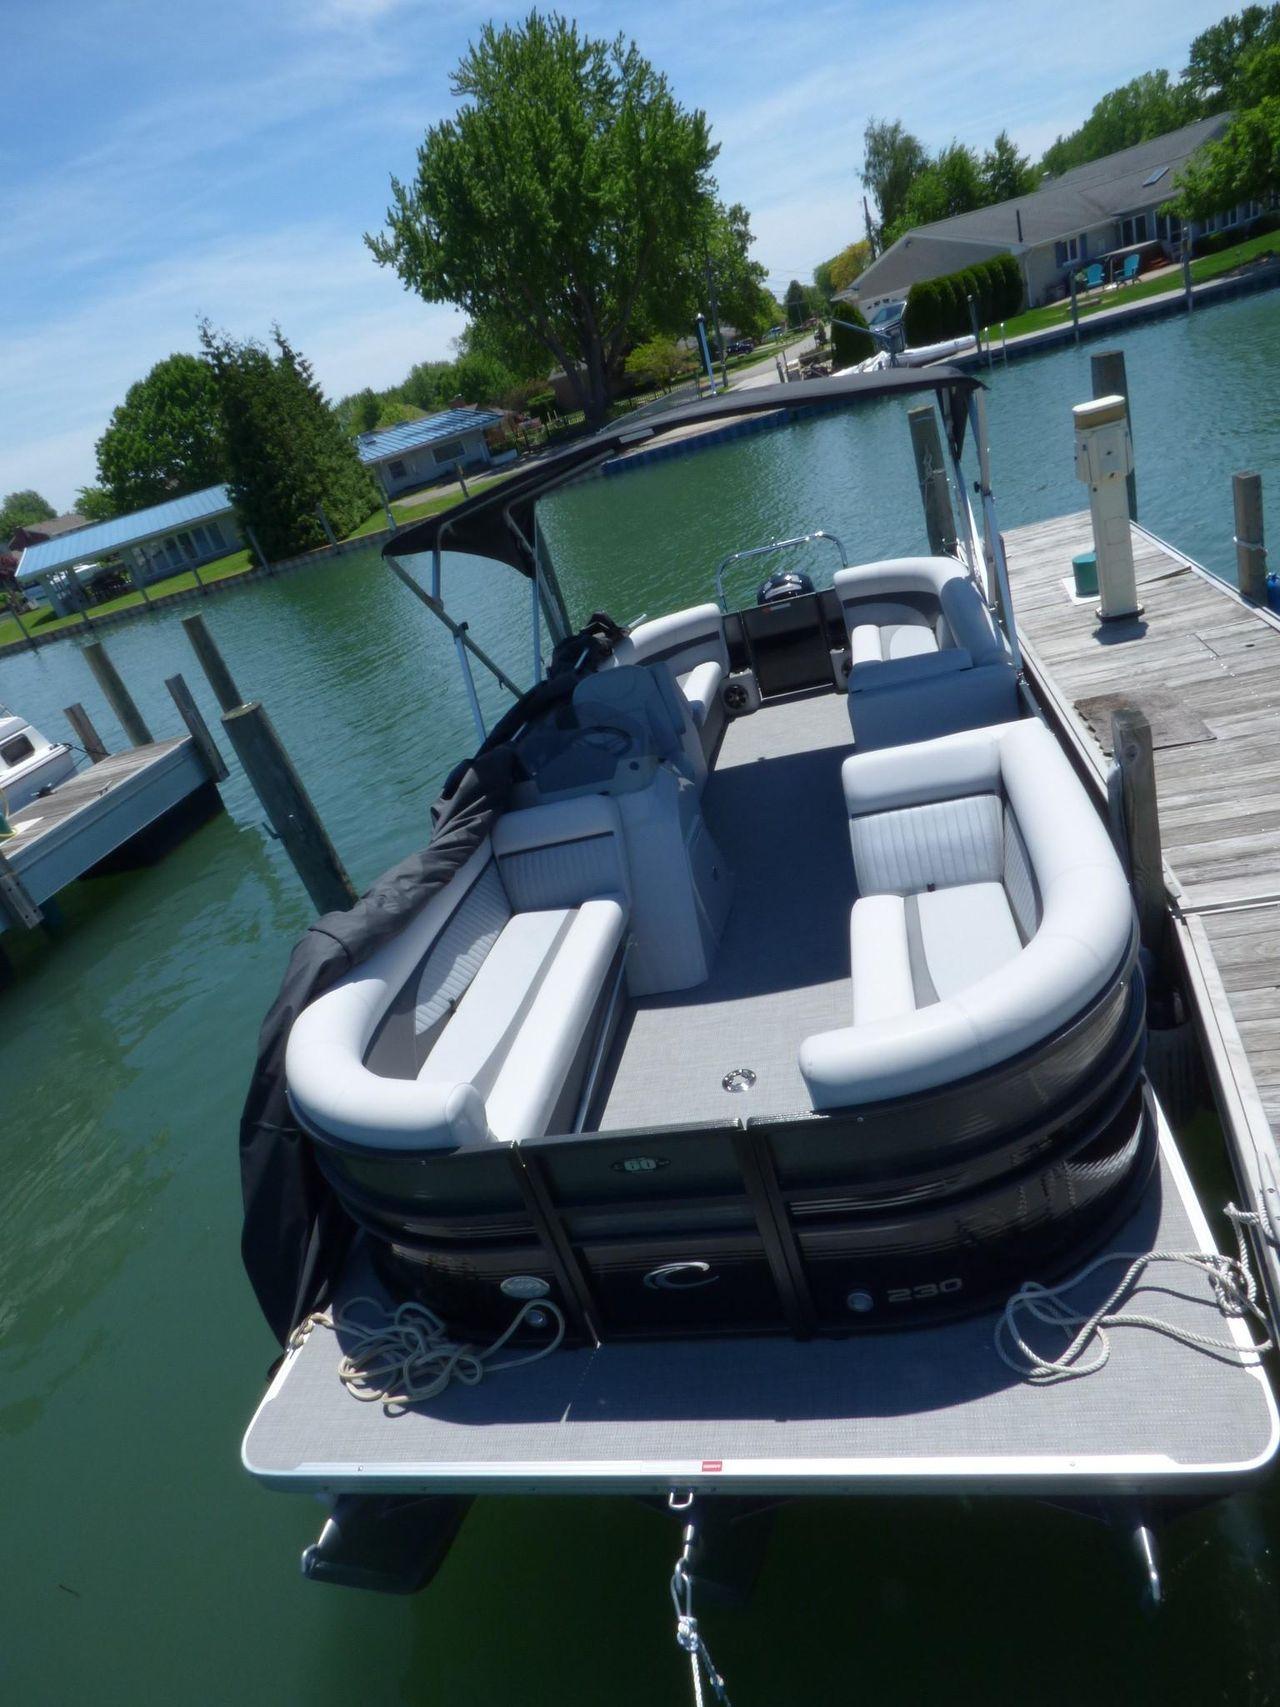 2017 Used Crest 230 Sl Tri Pontoon Boat For Sale 44 900